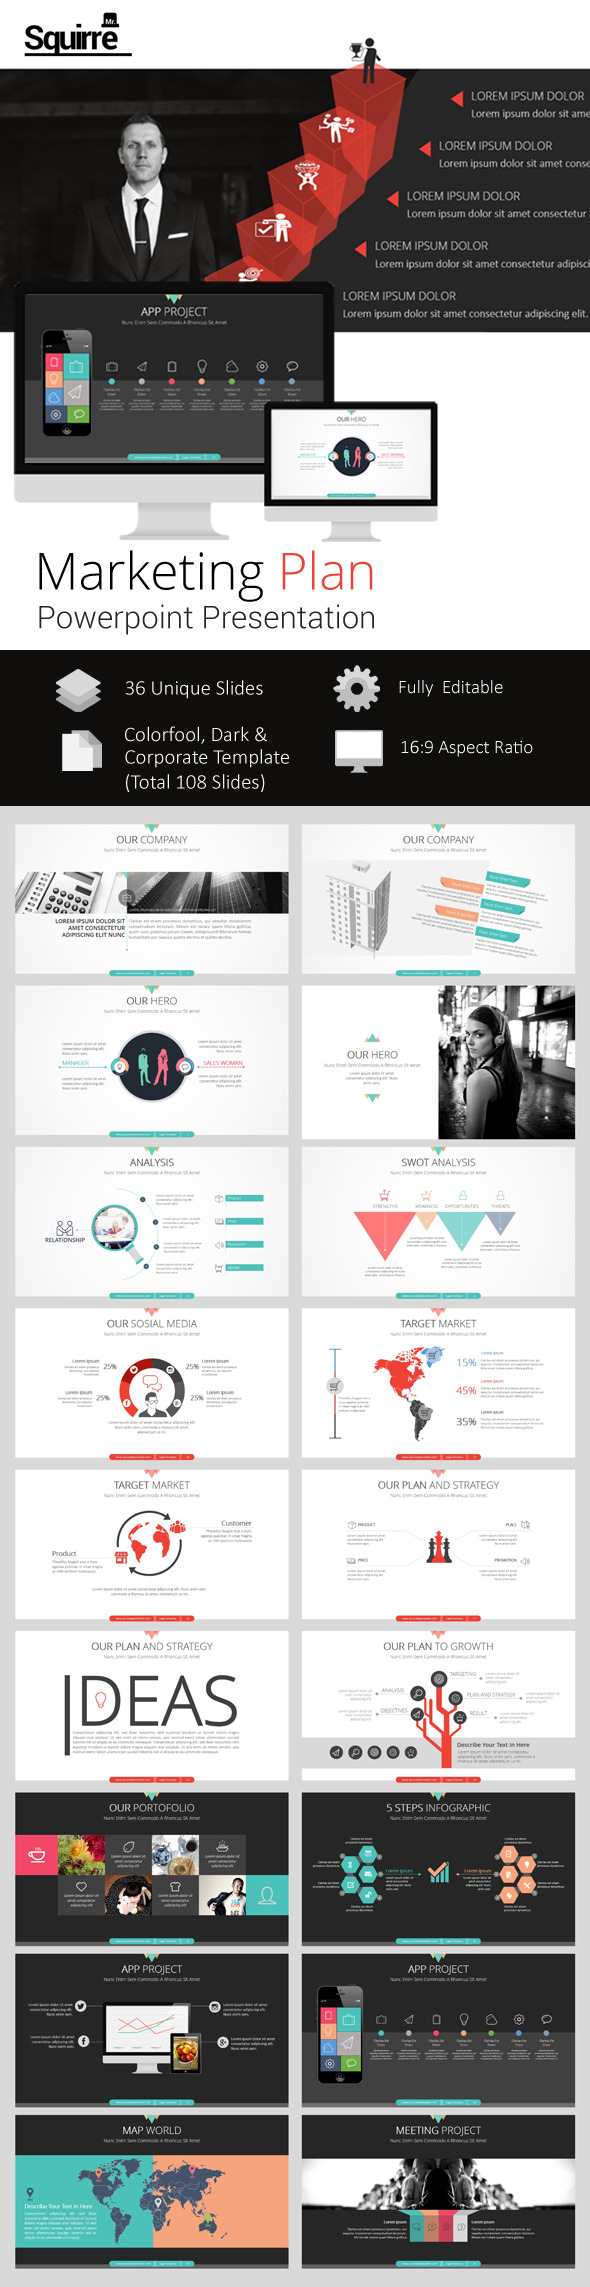 GraphicRiver Marketing Plan Powerpoint Presentation 9513379